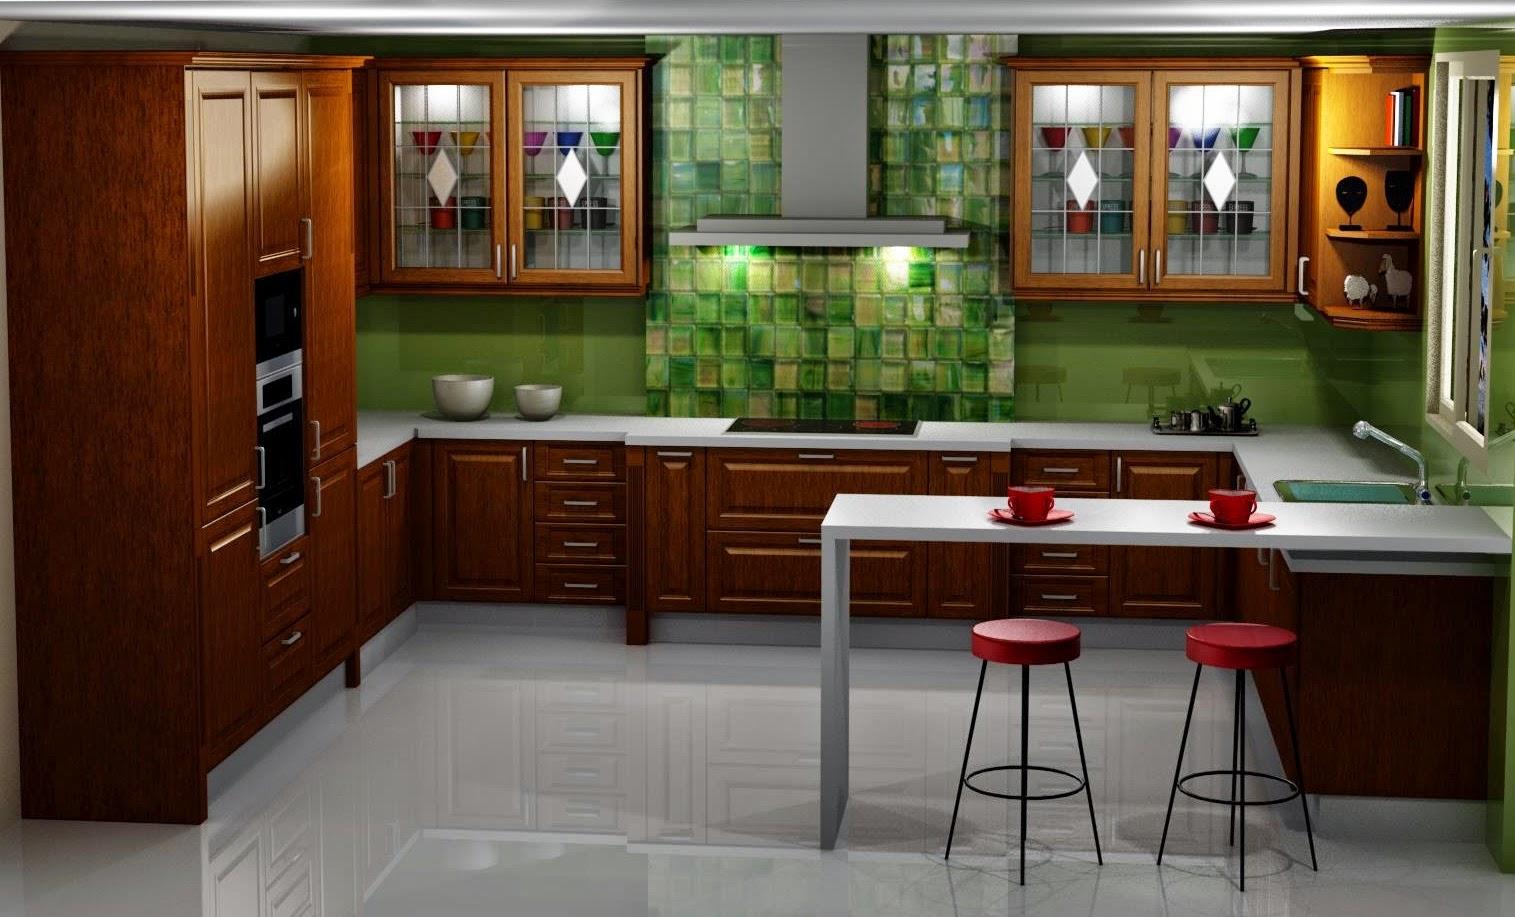 Dise o muebles de cocina dise o de cocina comedor en madera for Imagenes de cocina comedor